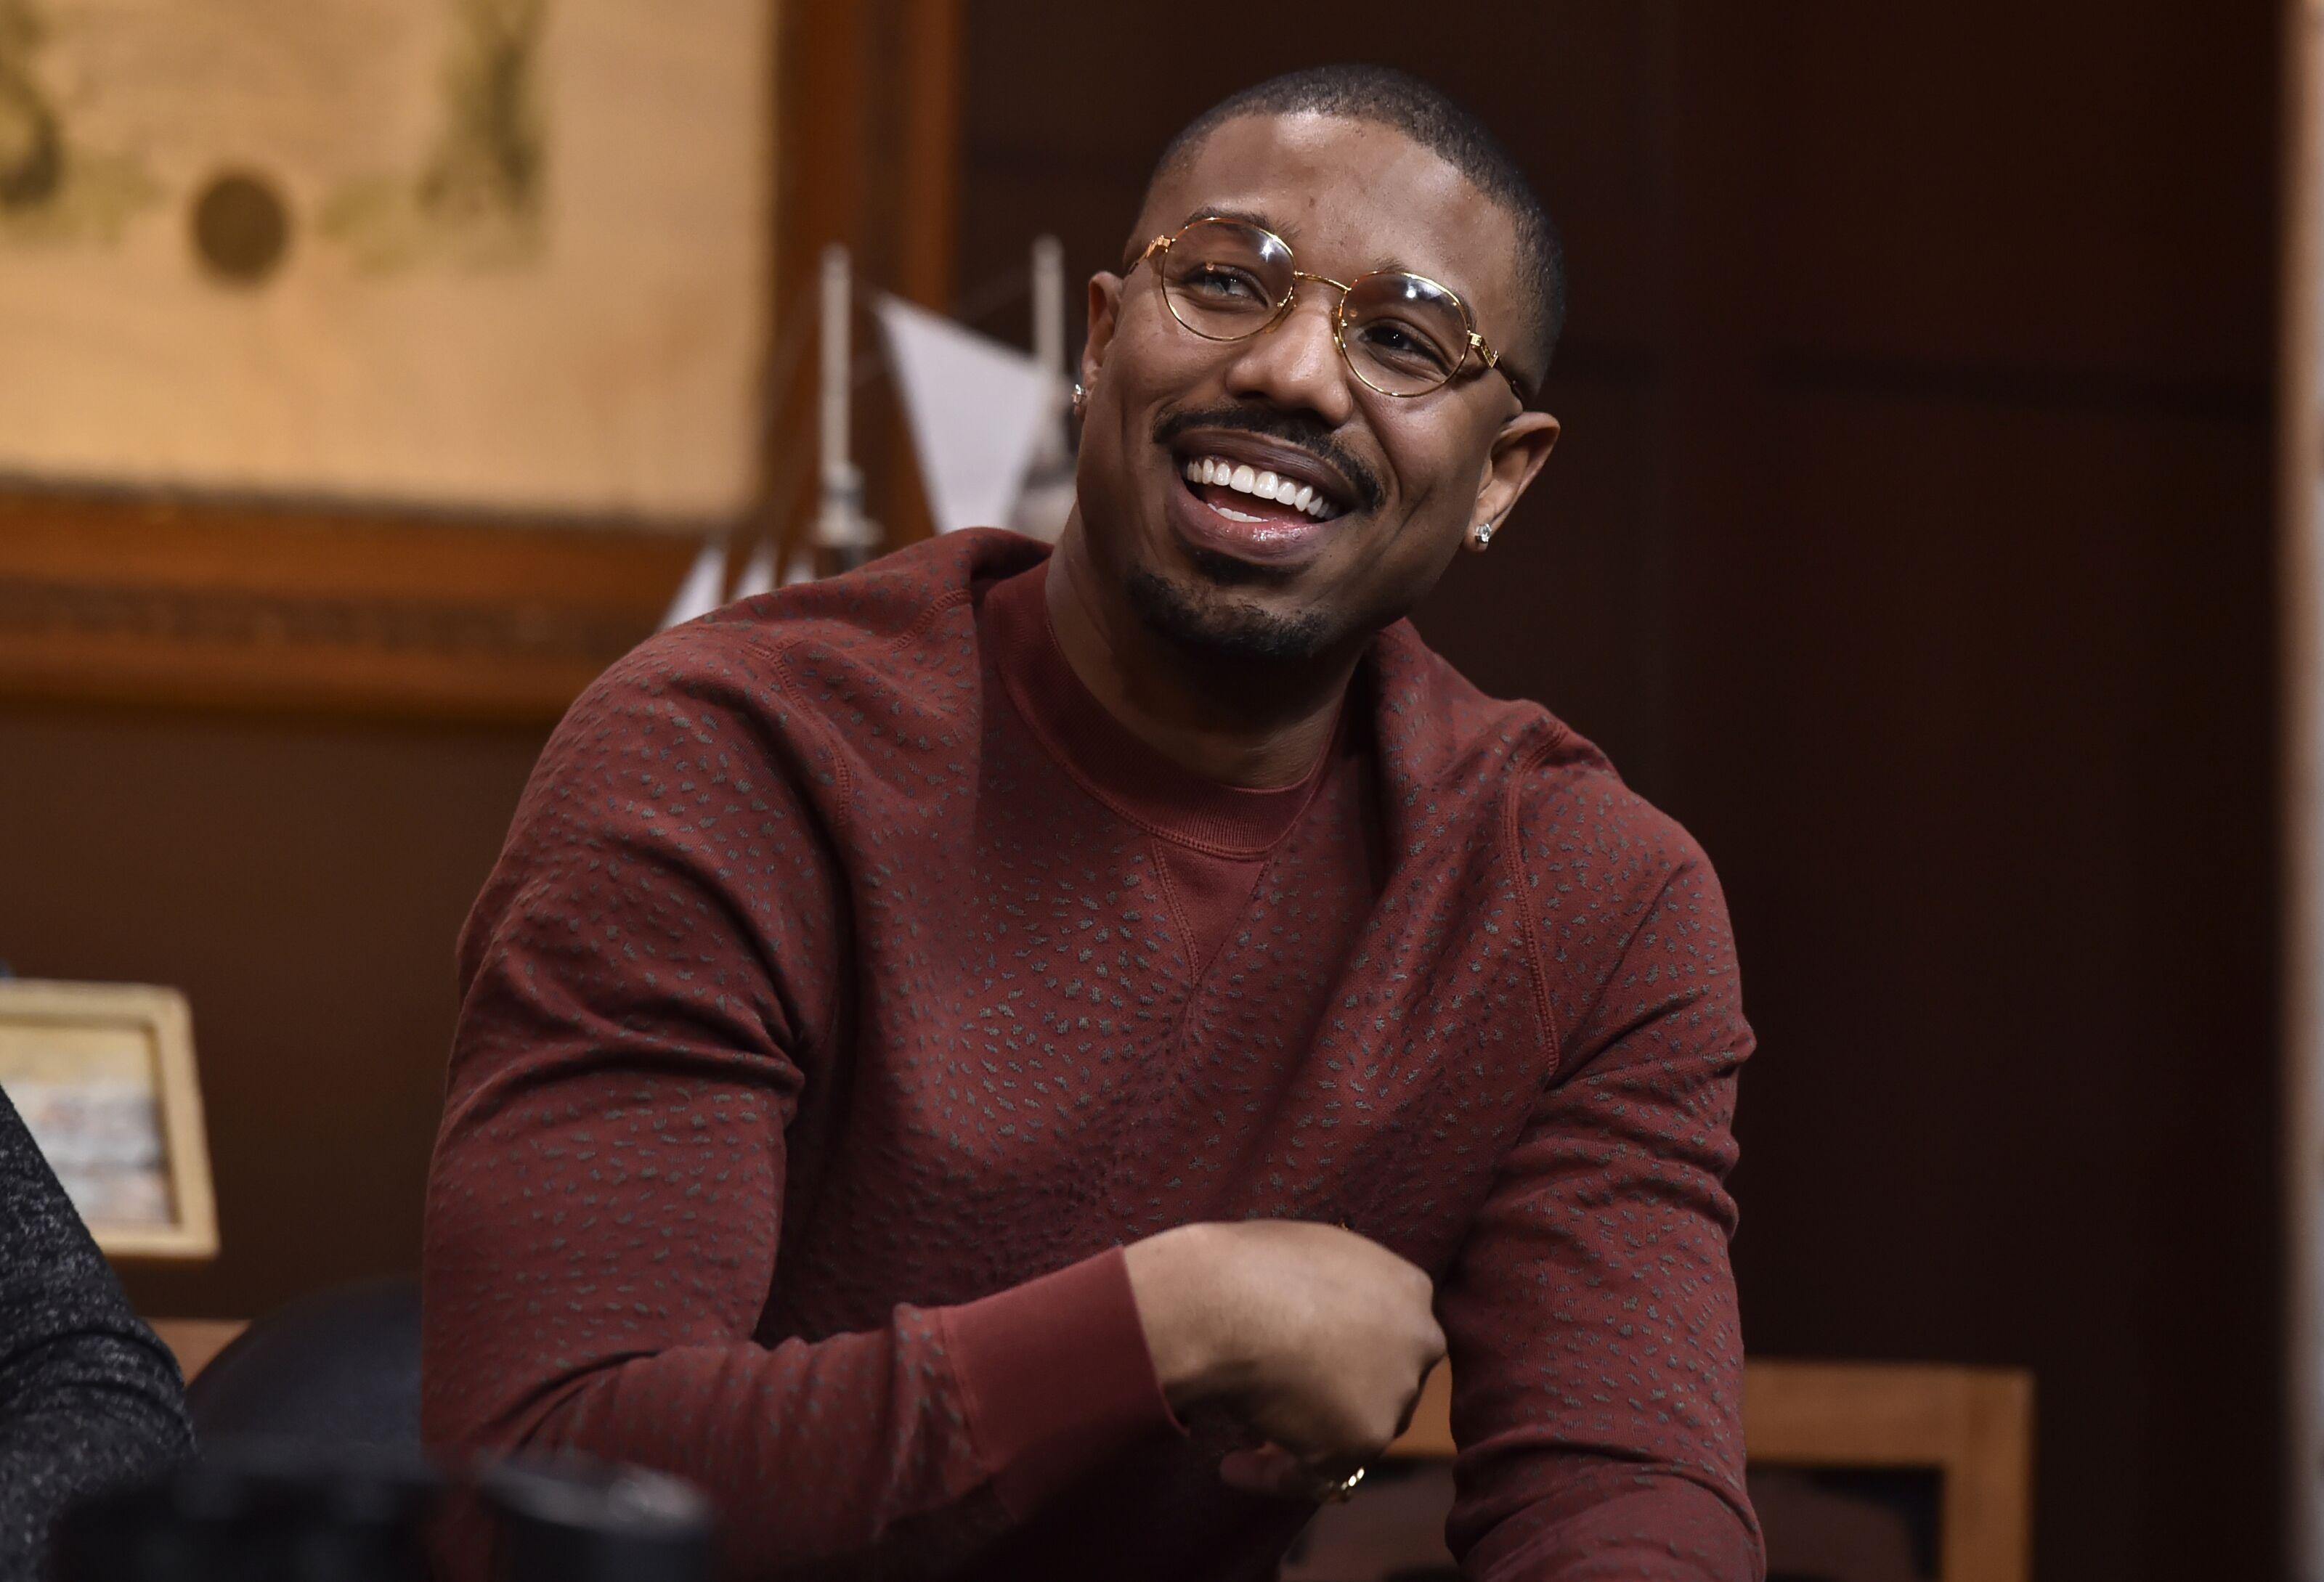 Michael B. Jordan's upcoming African fantasy film is the adaptation this genre needs